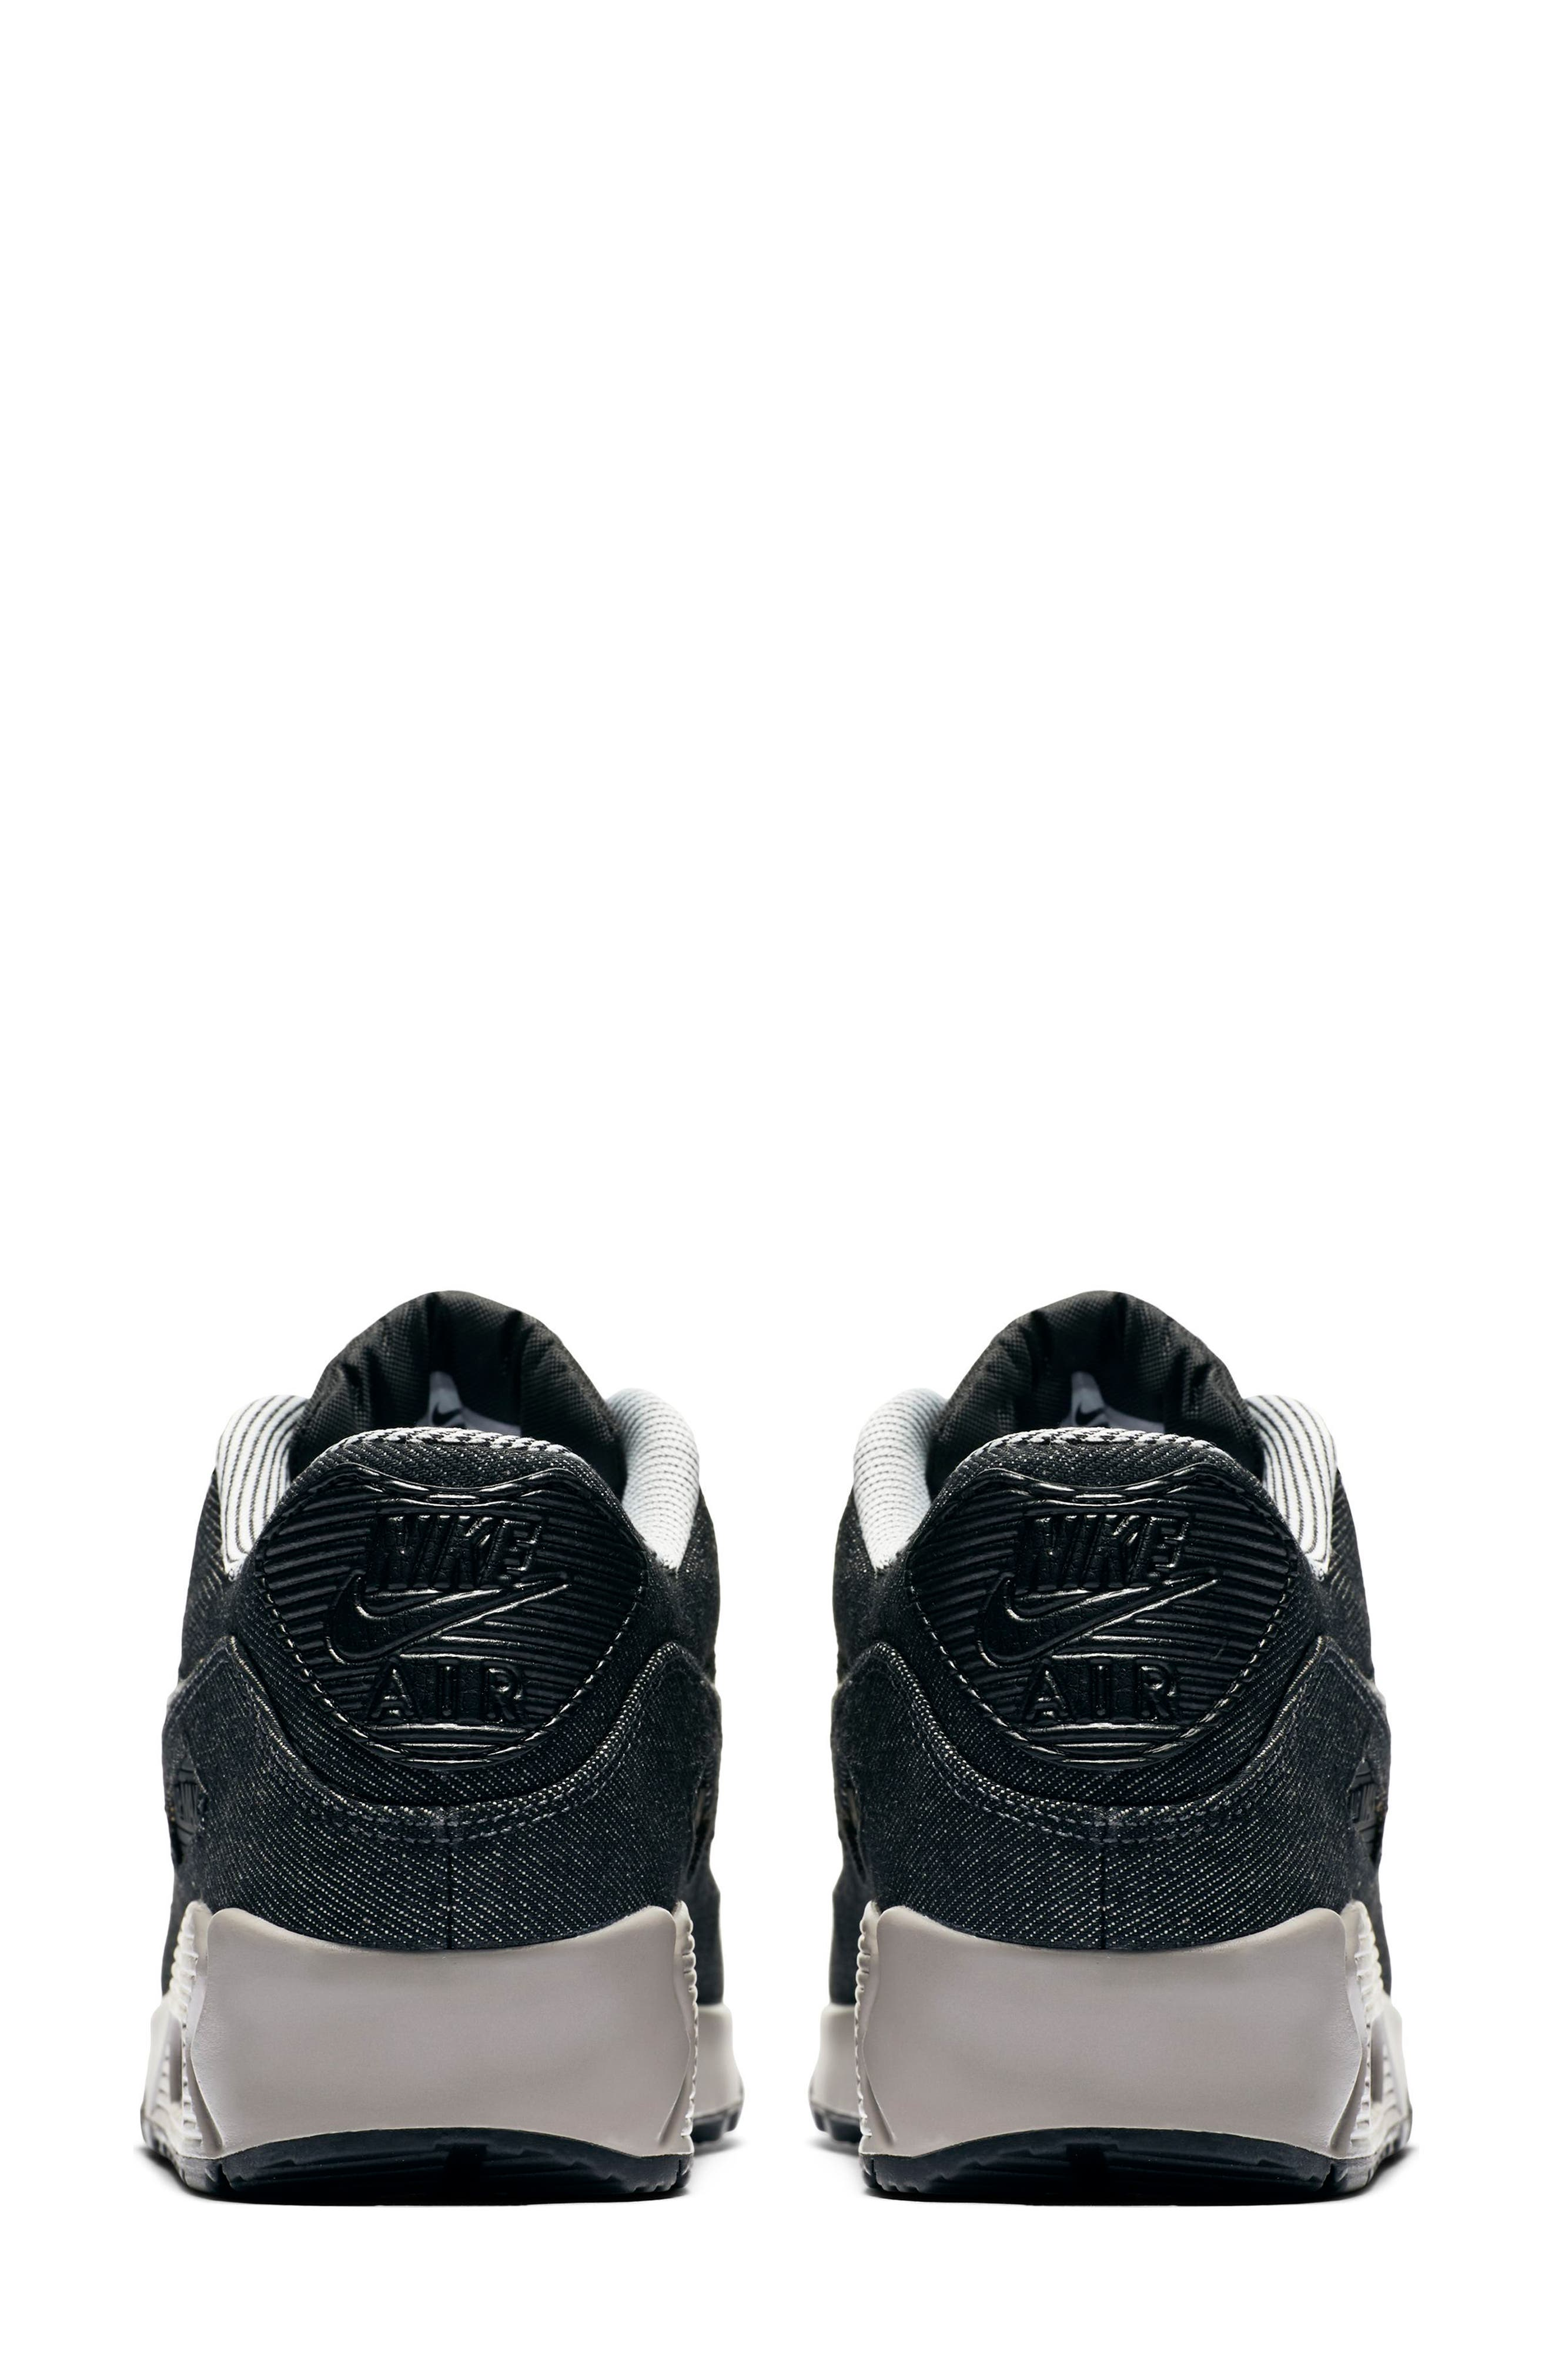 Air Max 90 SE Sneaker,                             Alternate thumbnail 14, color,